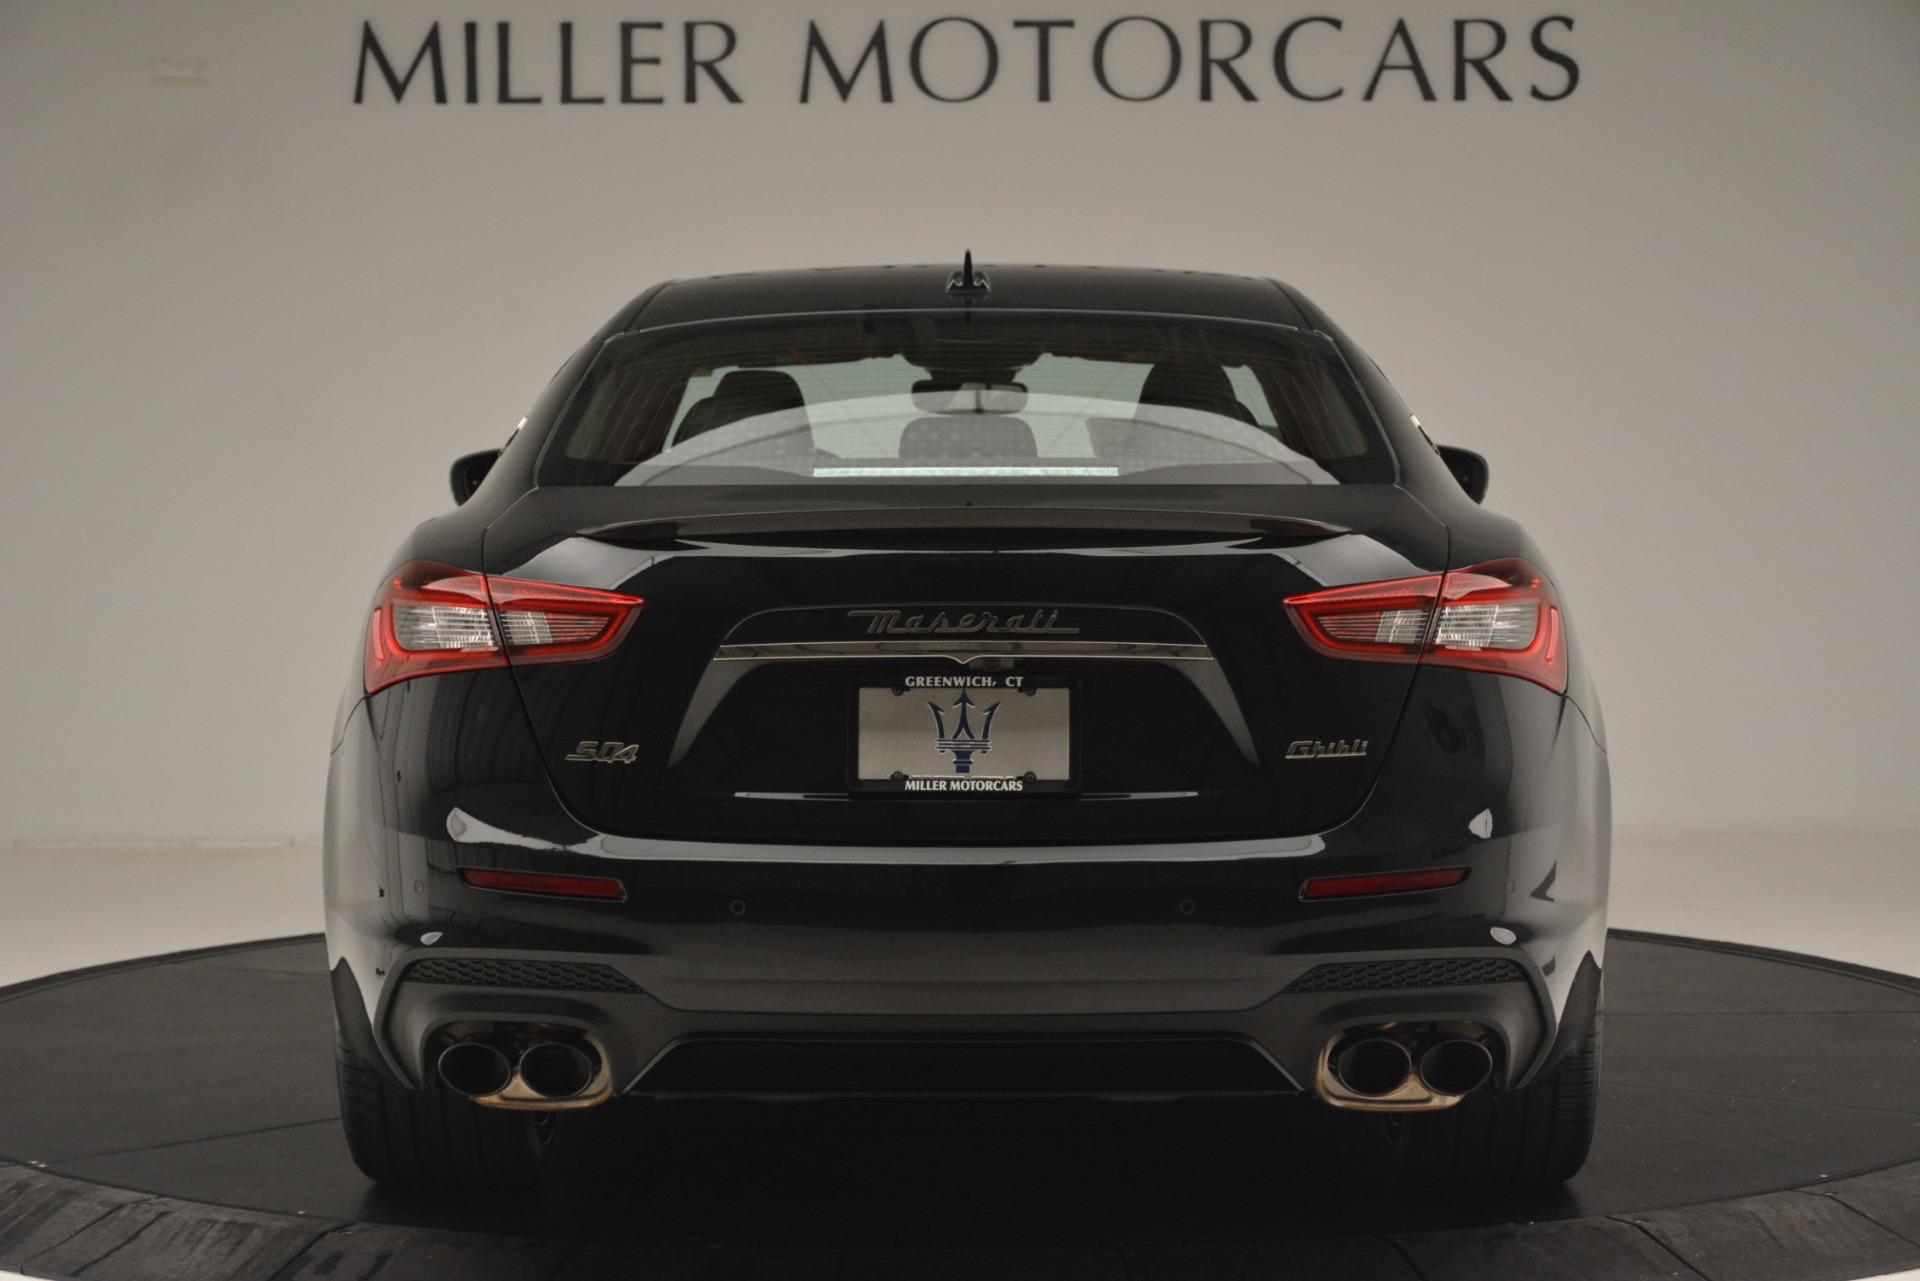 New 2019 Maserati Ghibli S Q4 GranSport For Sale In Westport, CT 2926_p6